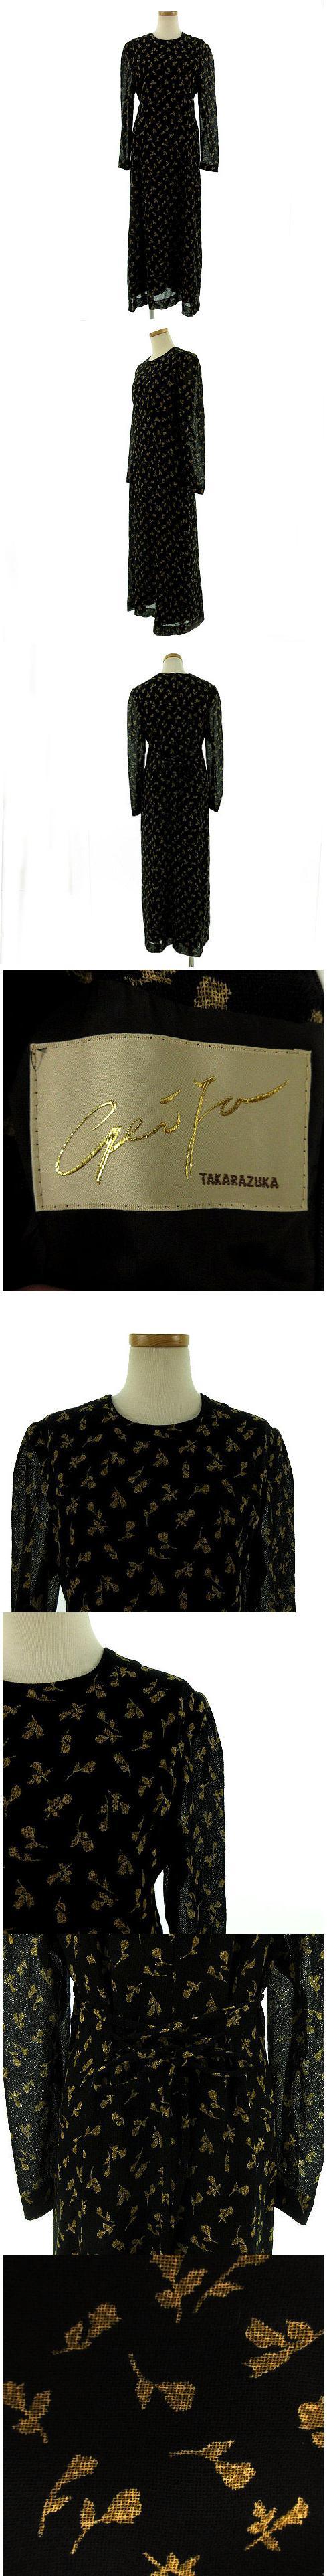 GeiTo TAKARAZUKA ワンピース マキシ 長袖 ウール混 シースルー 日本製 総柄 ブラック 黒 ベージュ 34